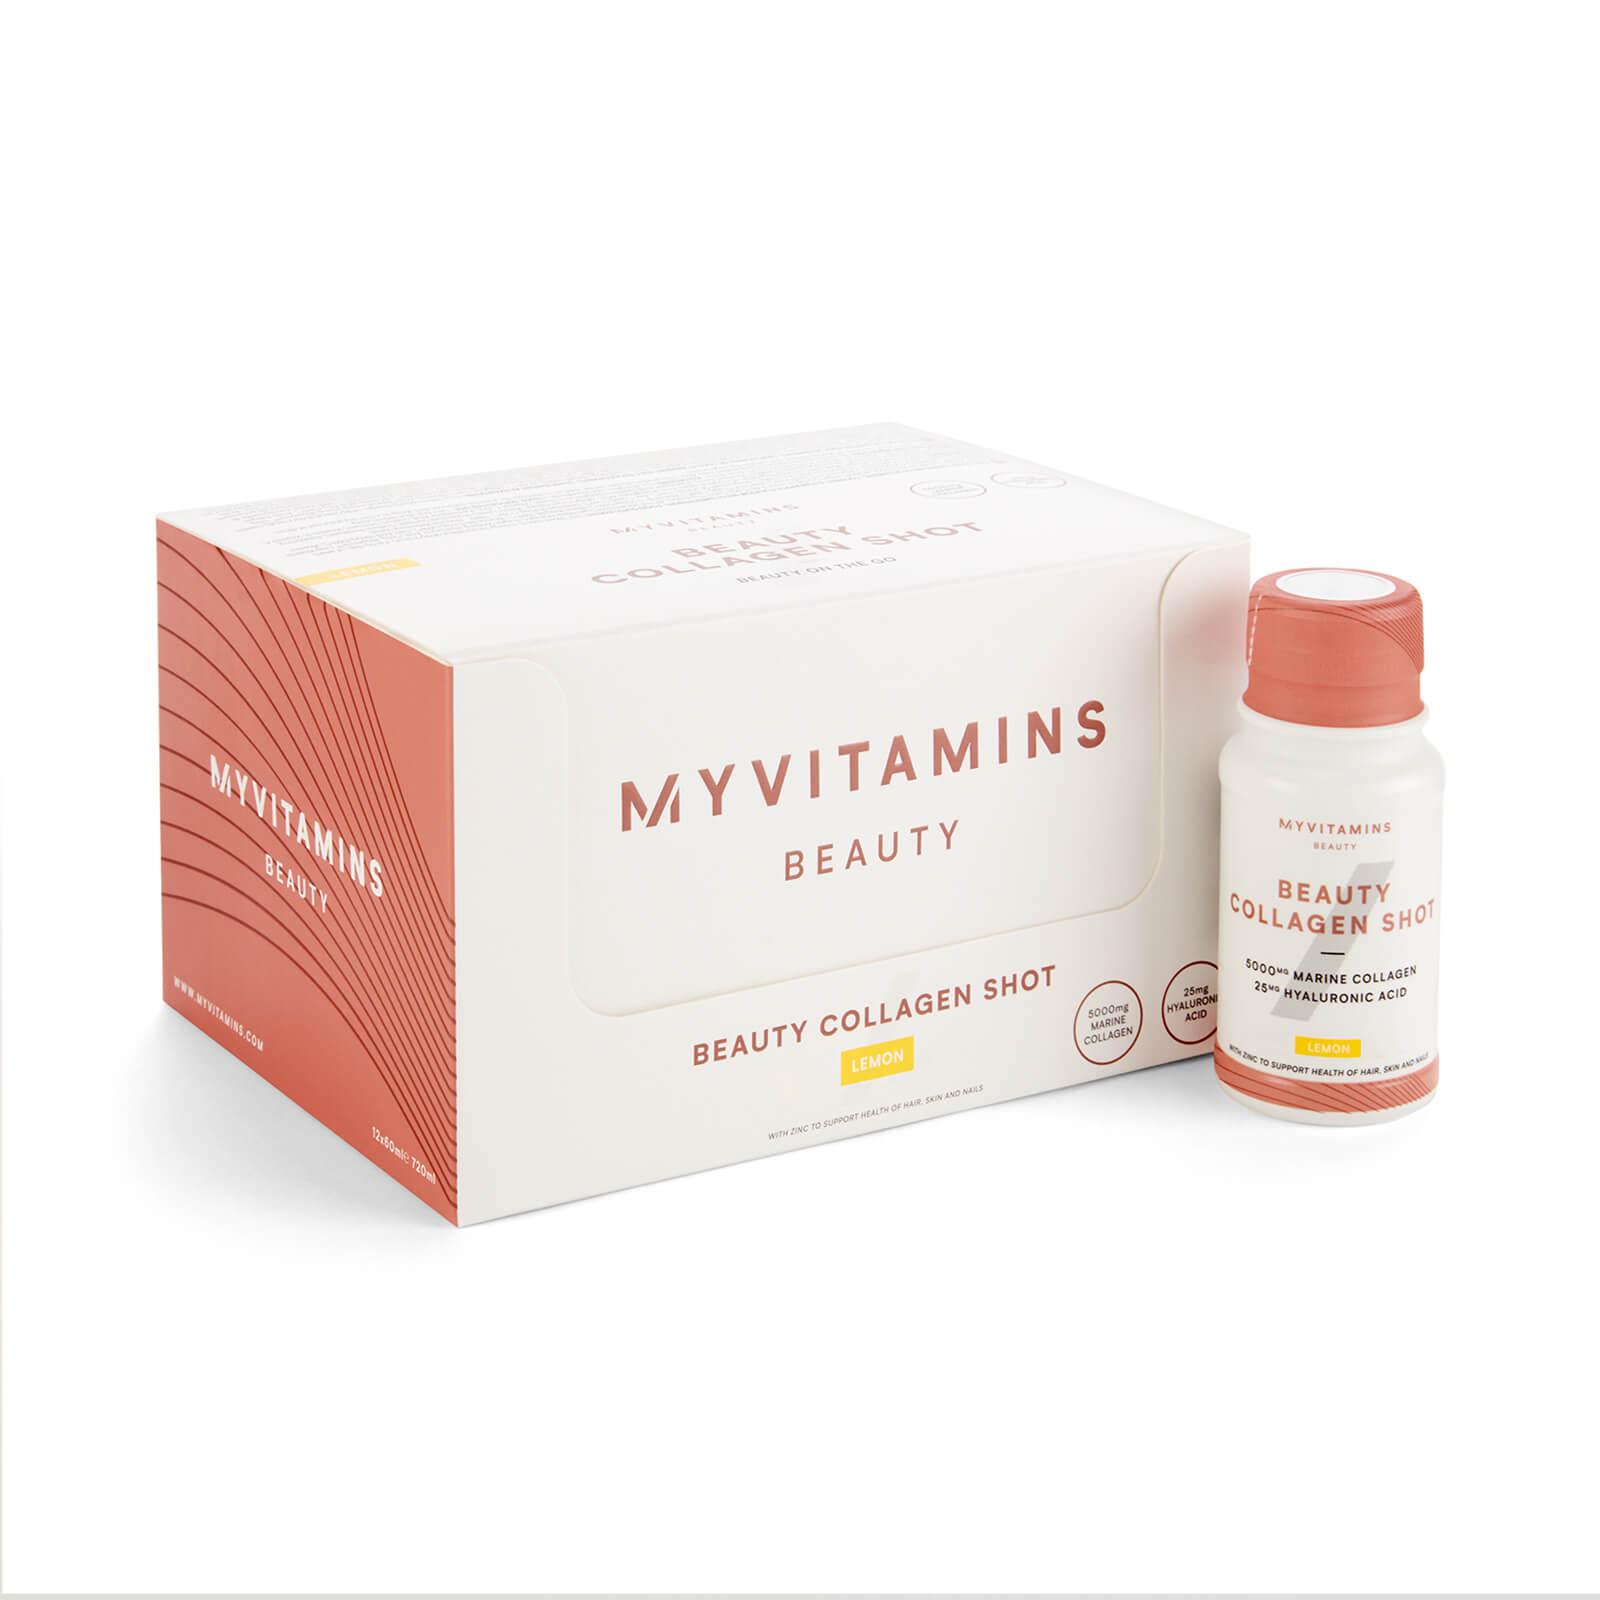 Myvitamins Beauty Collagen Shot  - 12 x 60ml - Lemon